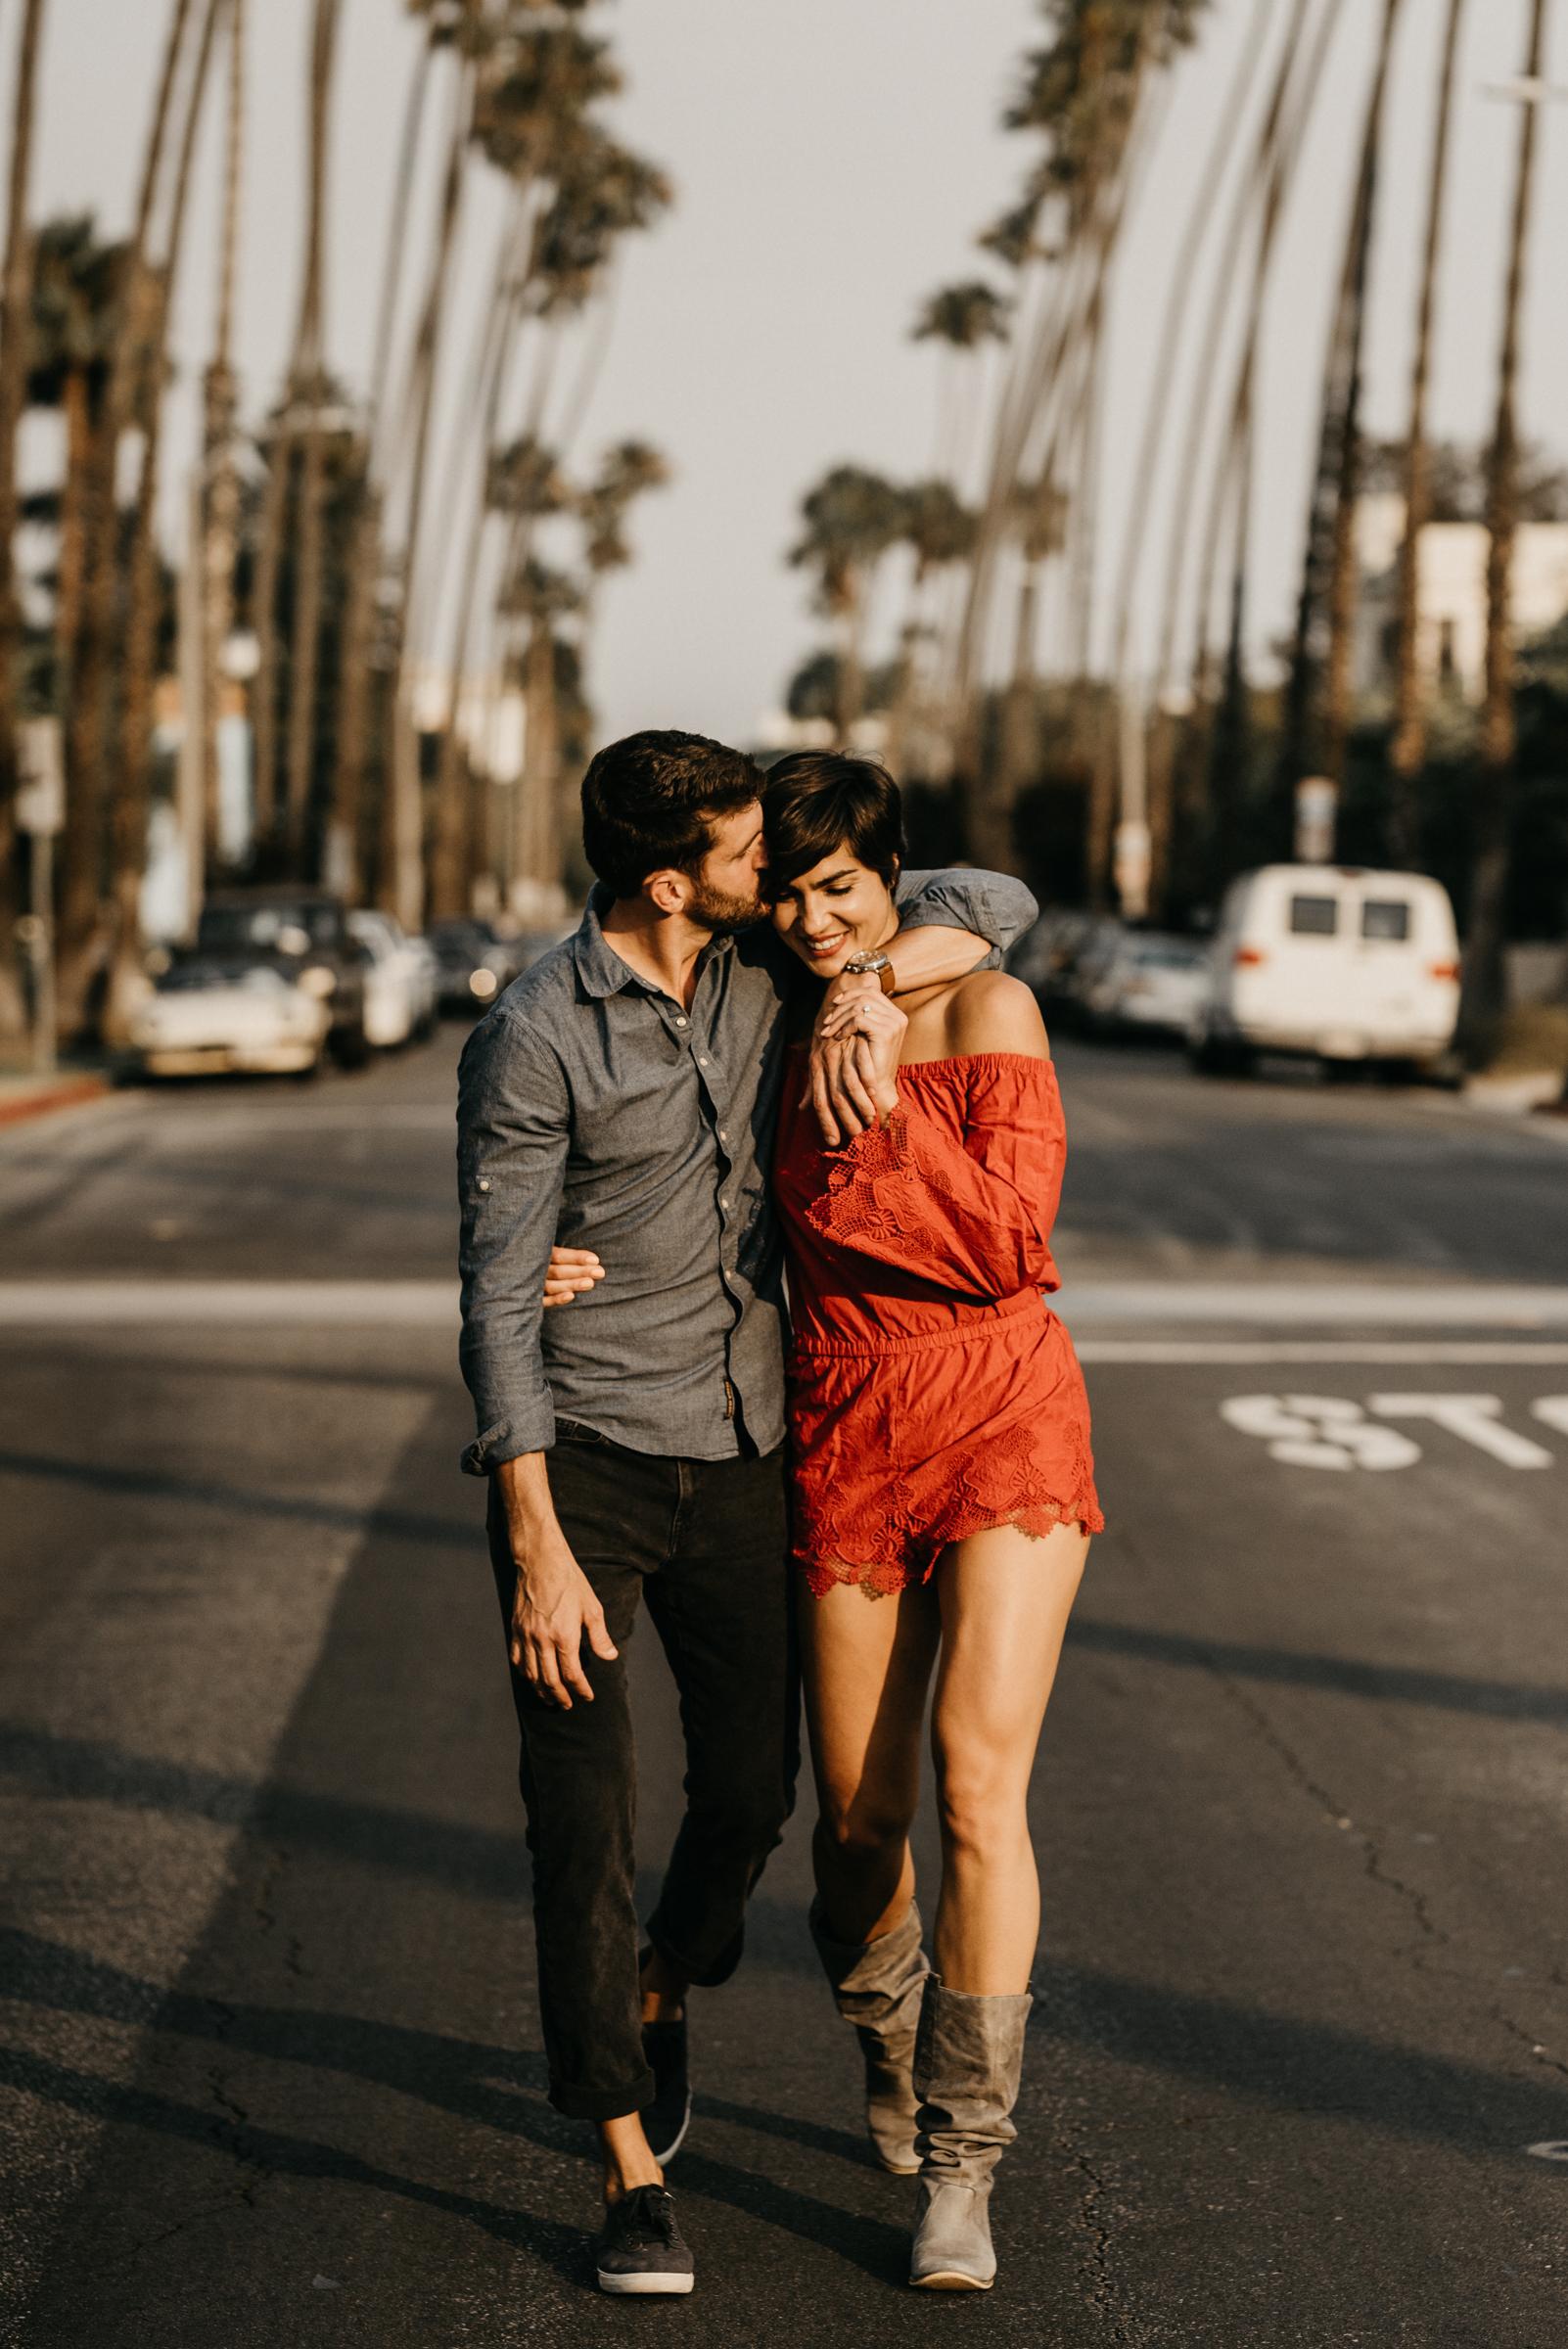 Isaiah + Taylor Photography - Santa Monica Engagement Session, Los Angeles Wedding Photographer-010.jpg